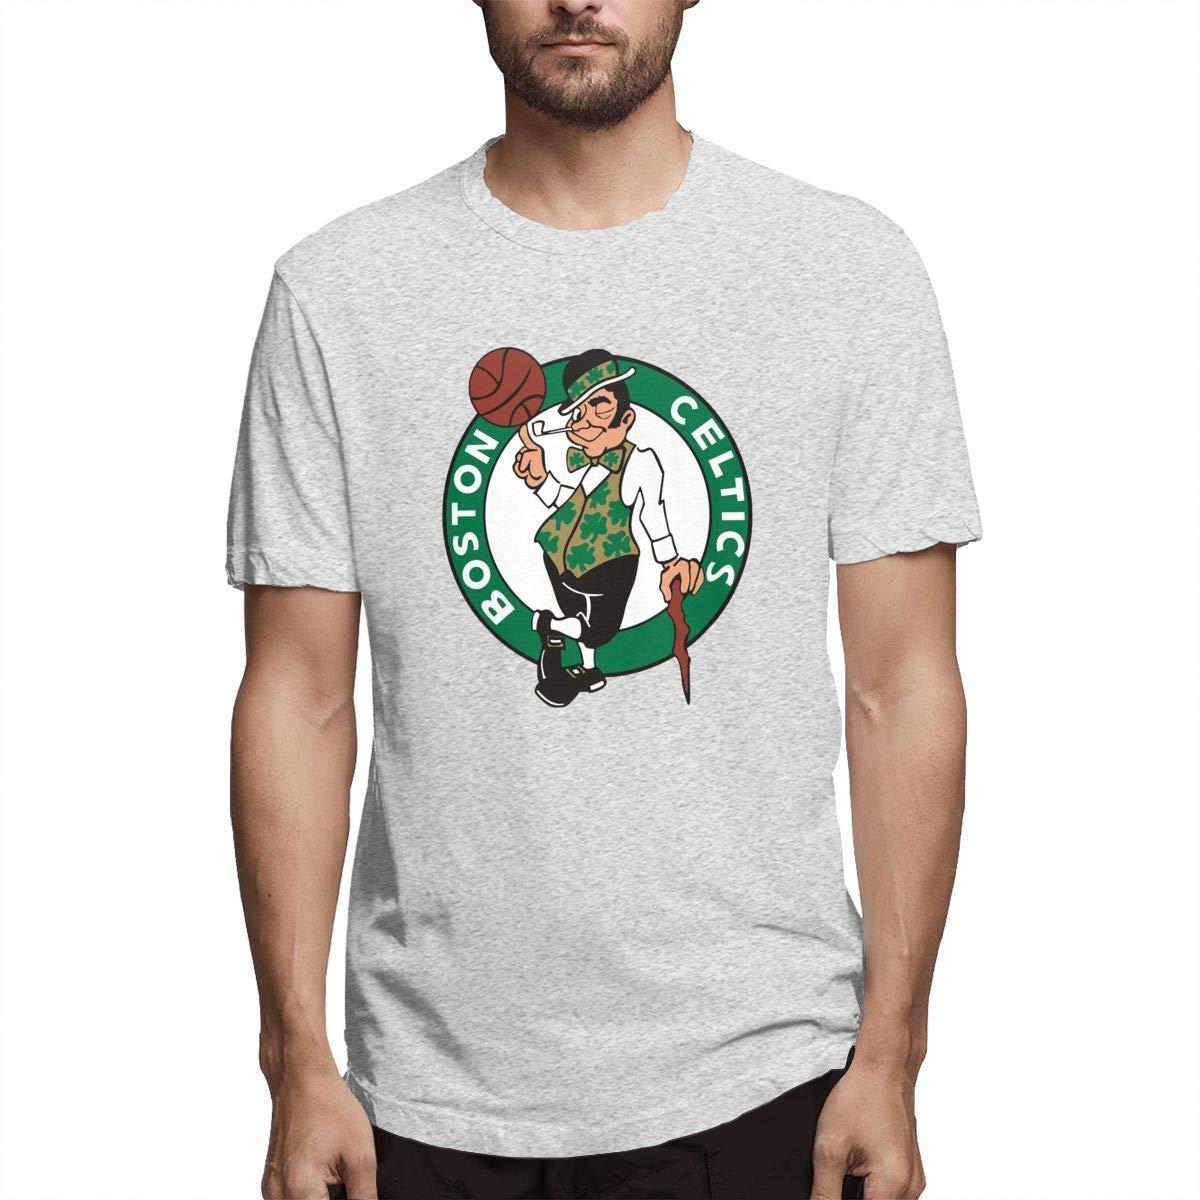 Ambulseek Celtics S Awesome Short Sleeve Tee Gray Shirts